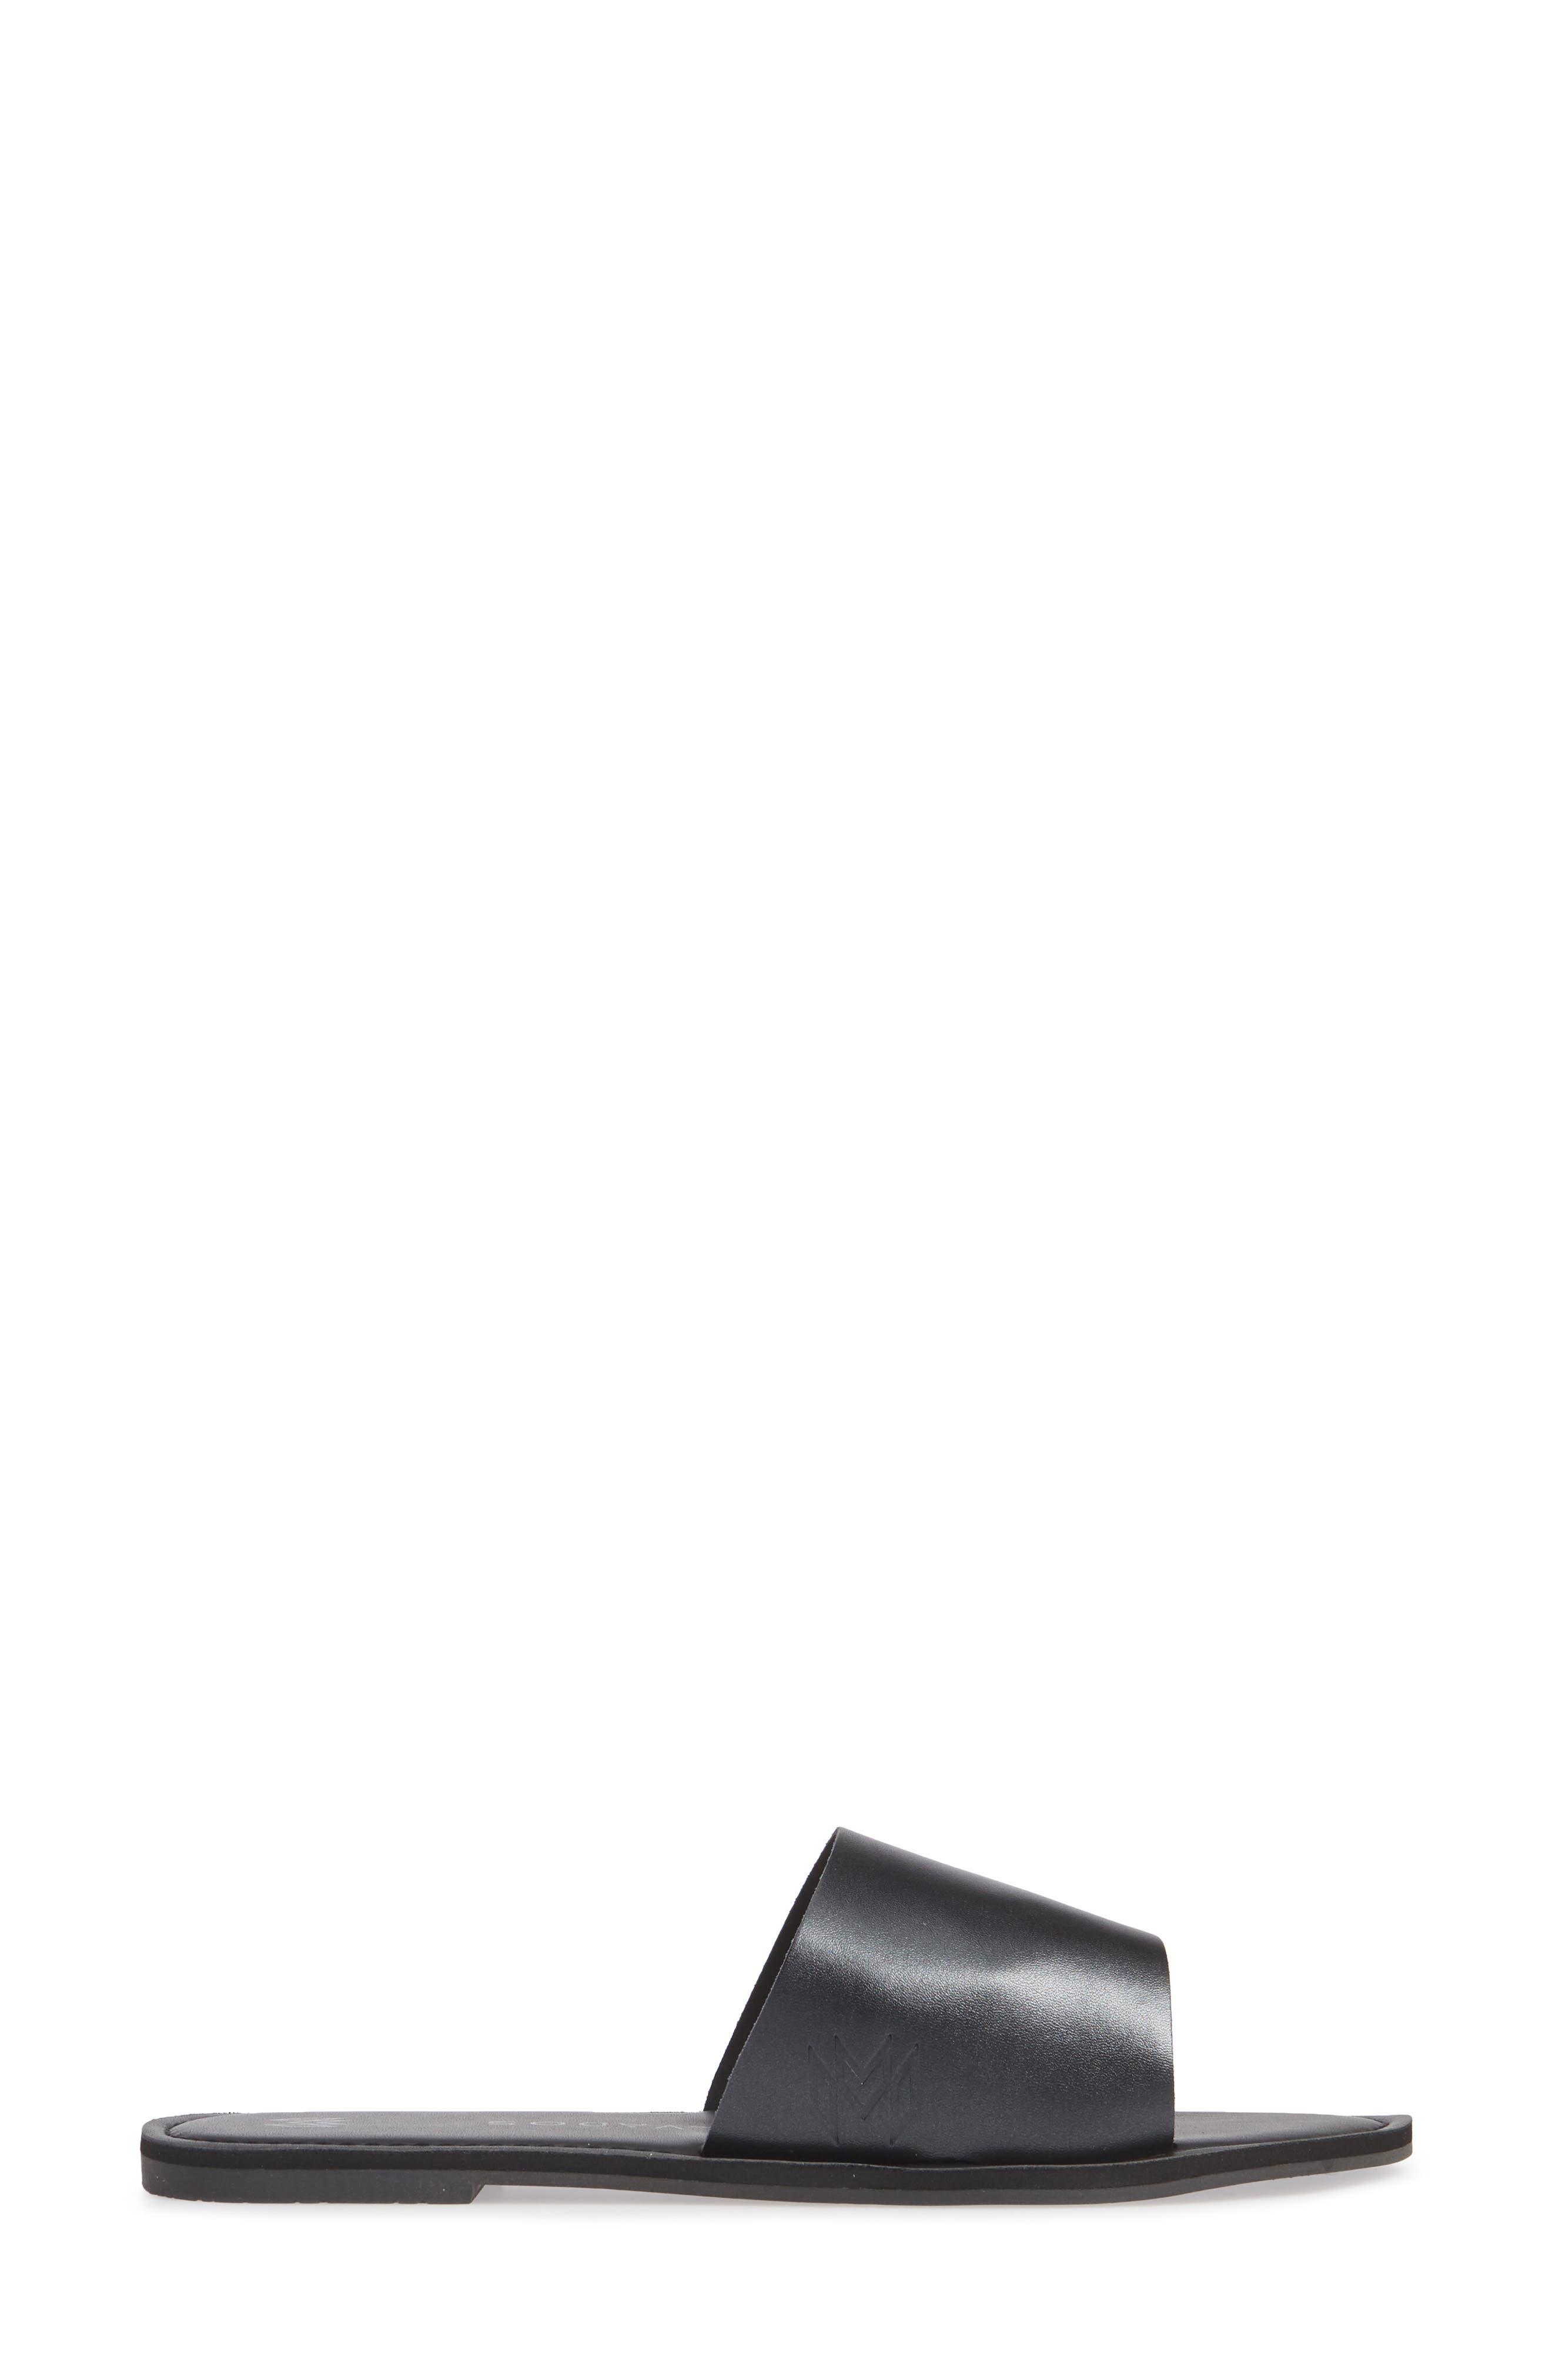 MALVADOS, Icon Taylor Noir Slide Sandal, Alternate thumbnail 3, color, LIQUORISH